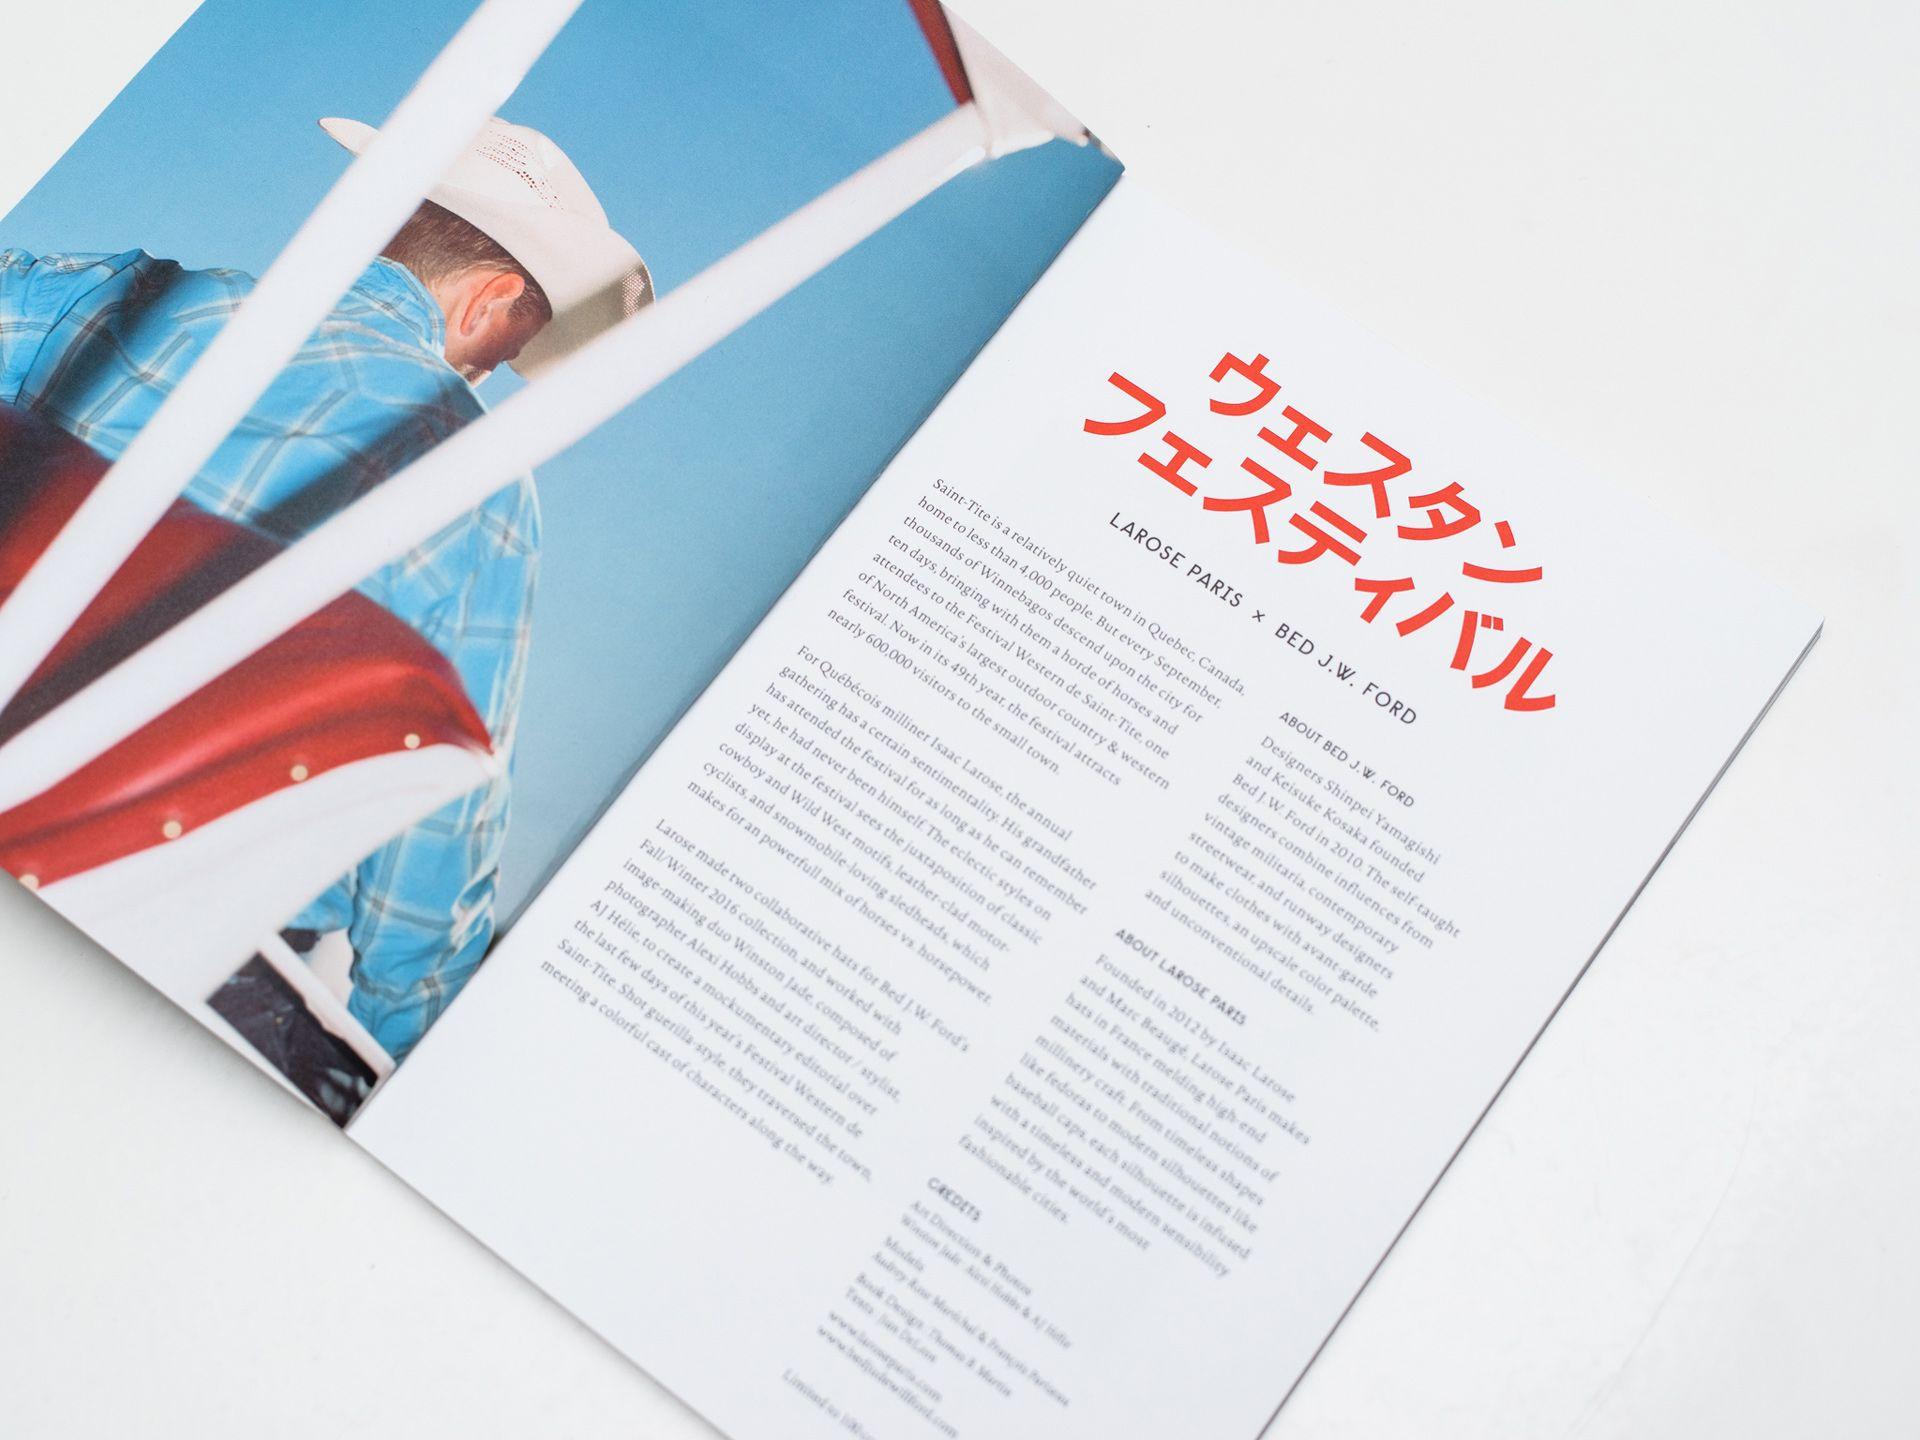 magazine by Alexi Hobbs for Larose Paris in St-Tite